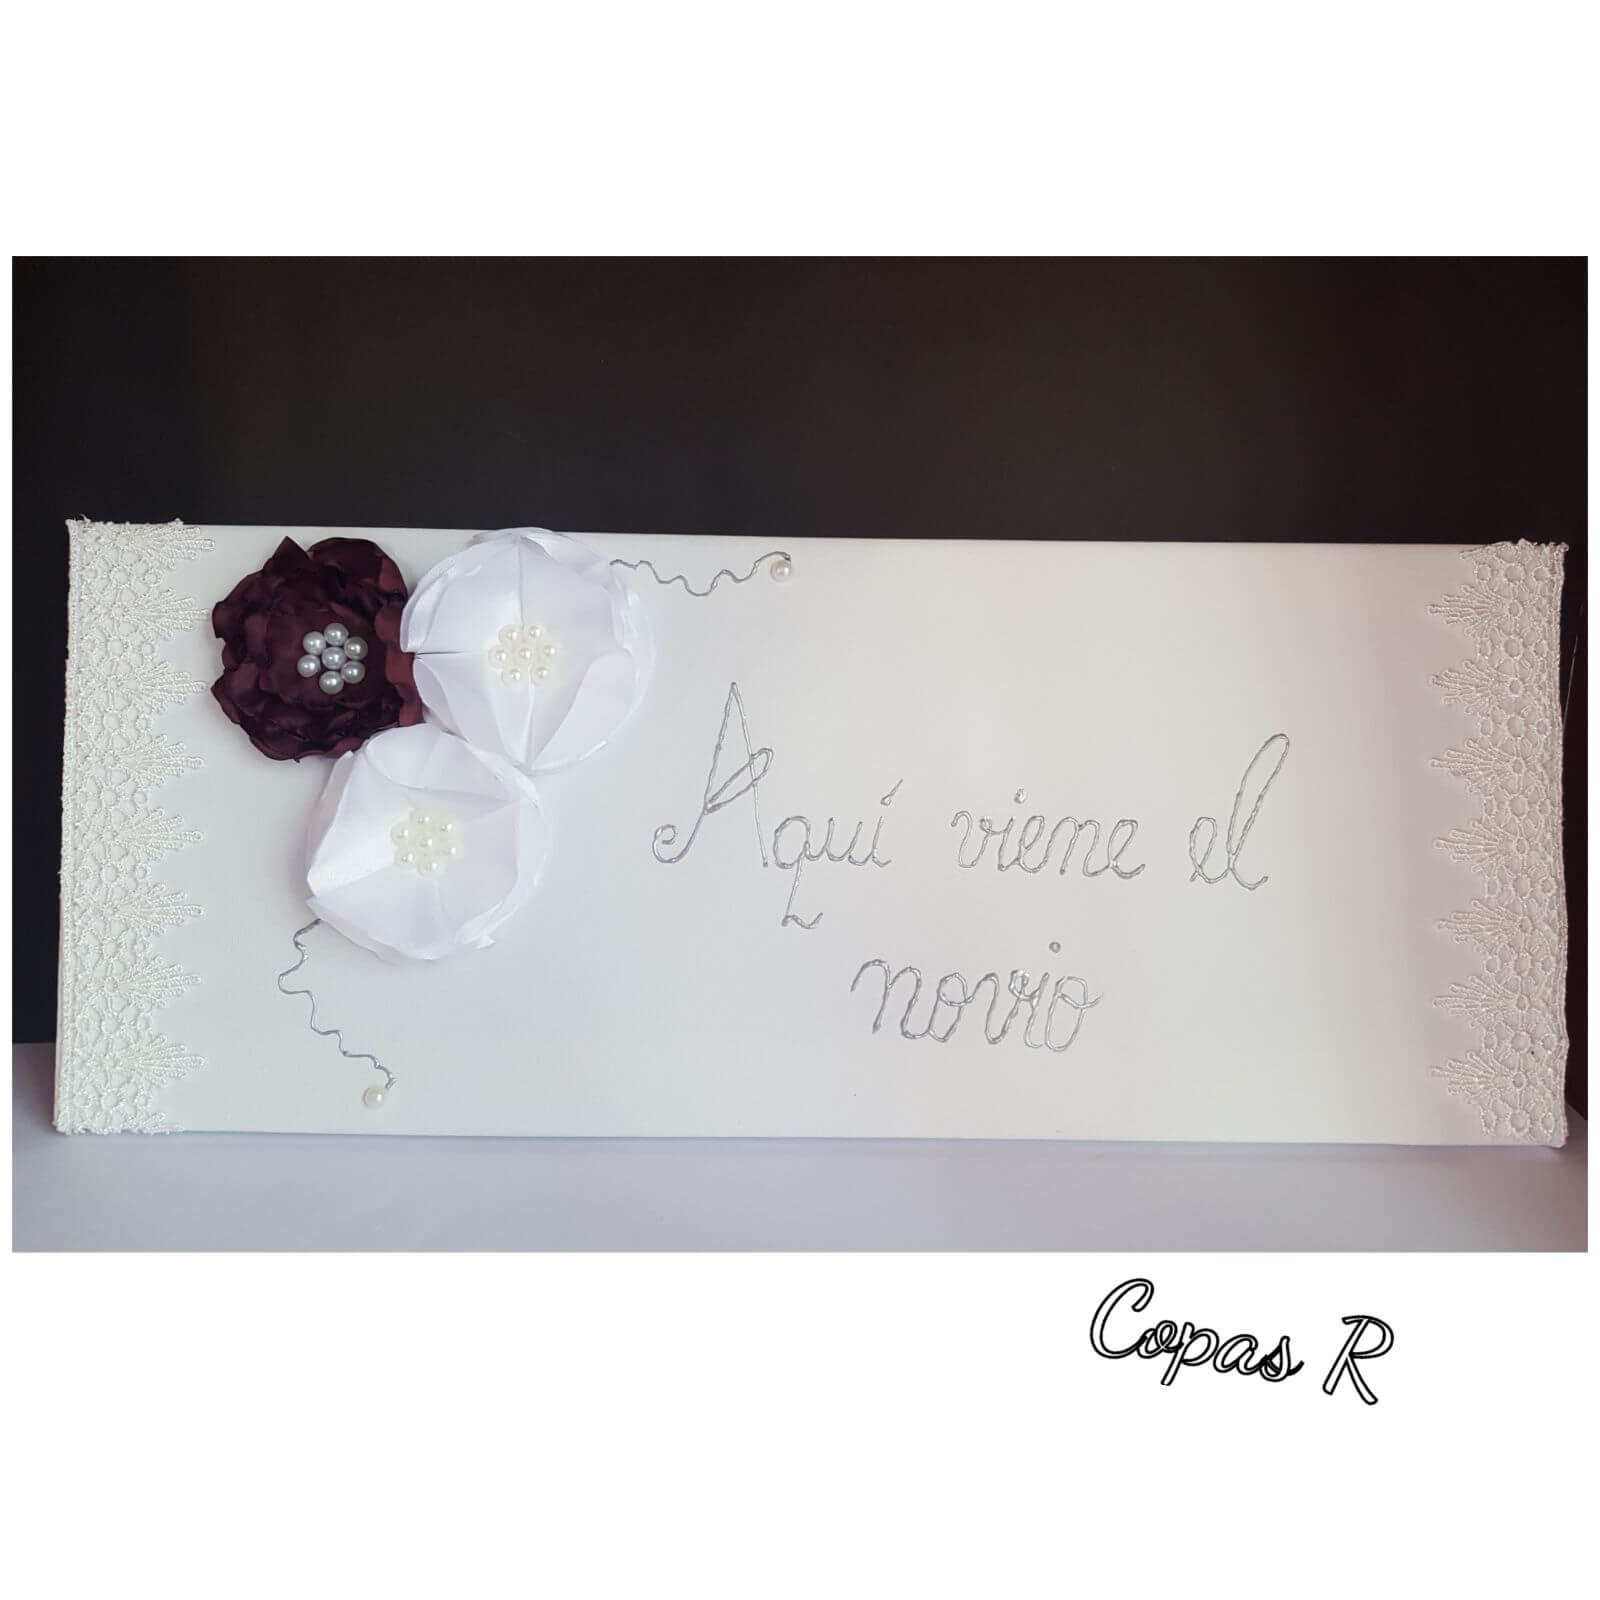 carteles boda carteles boda - carteles boda 3 - Carteles boda